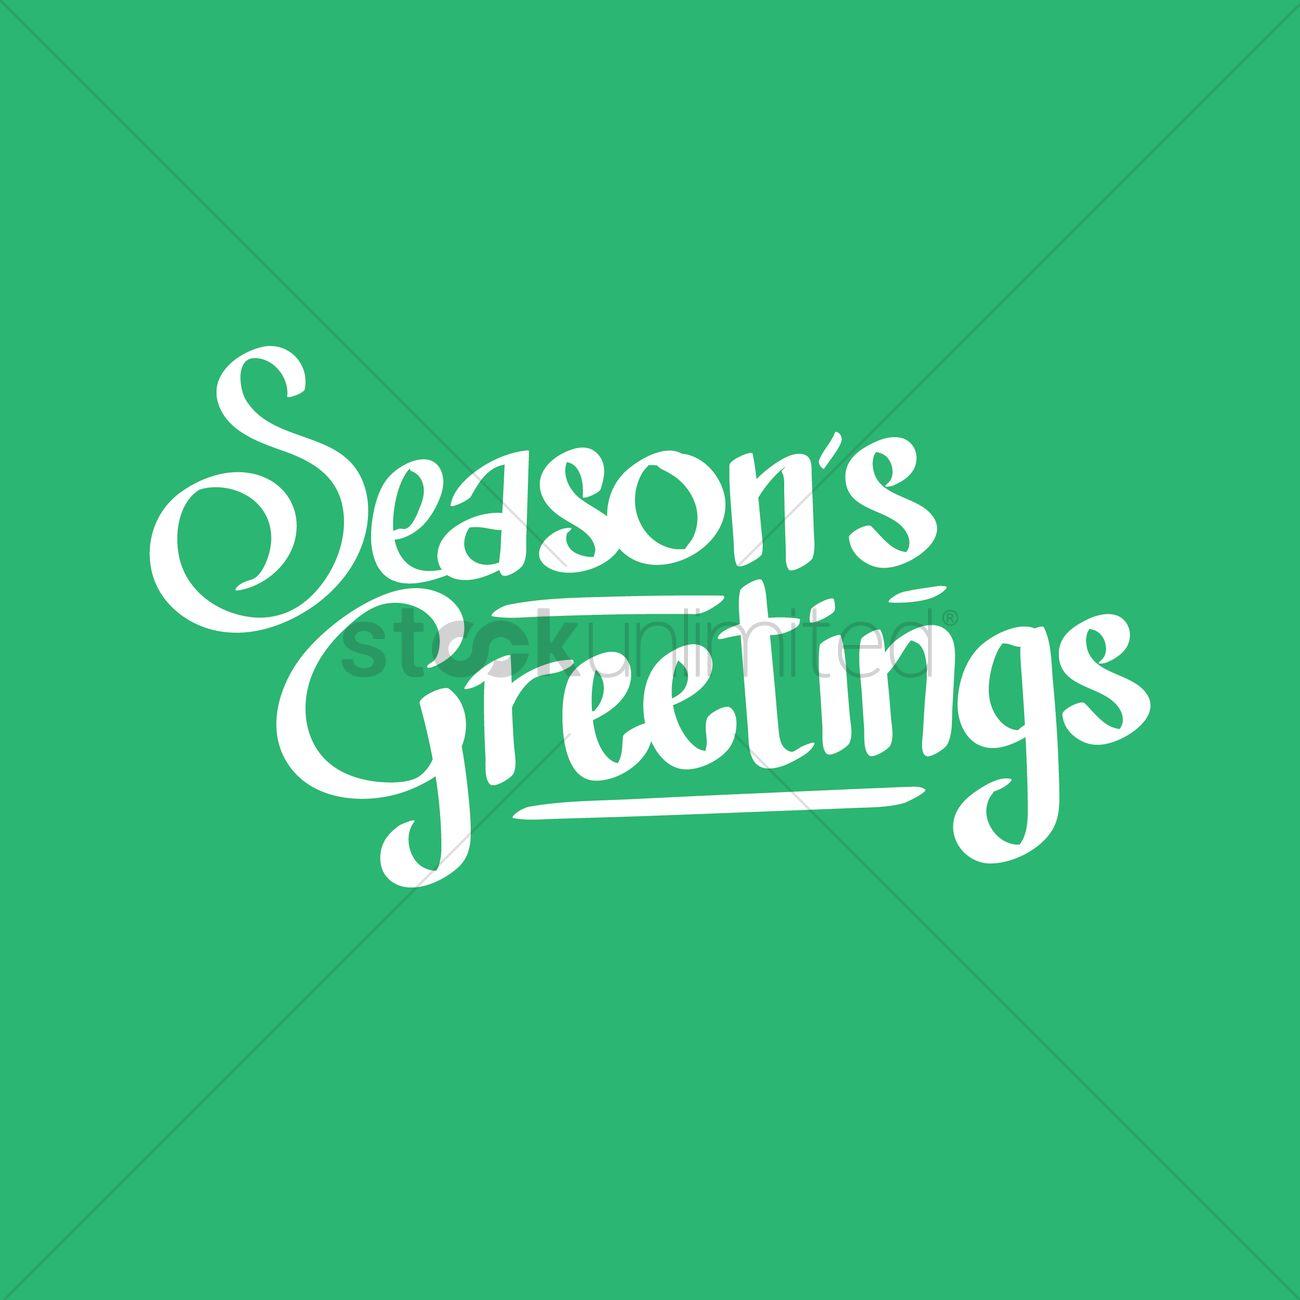 Seasons Greetings Vector Image 1924226 Stockunlimited